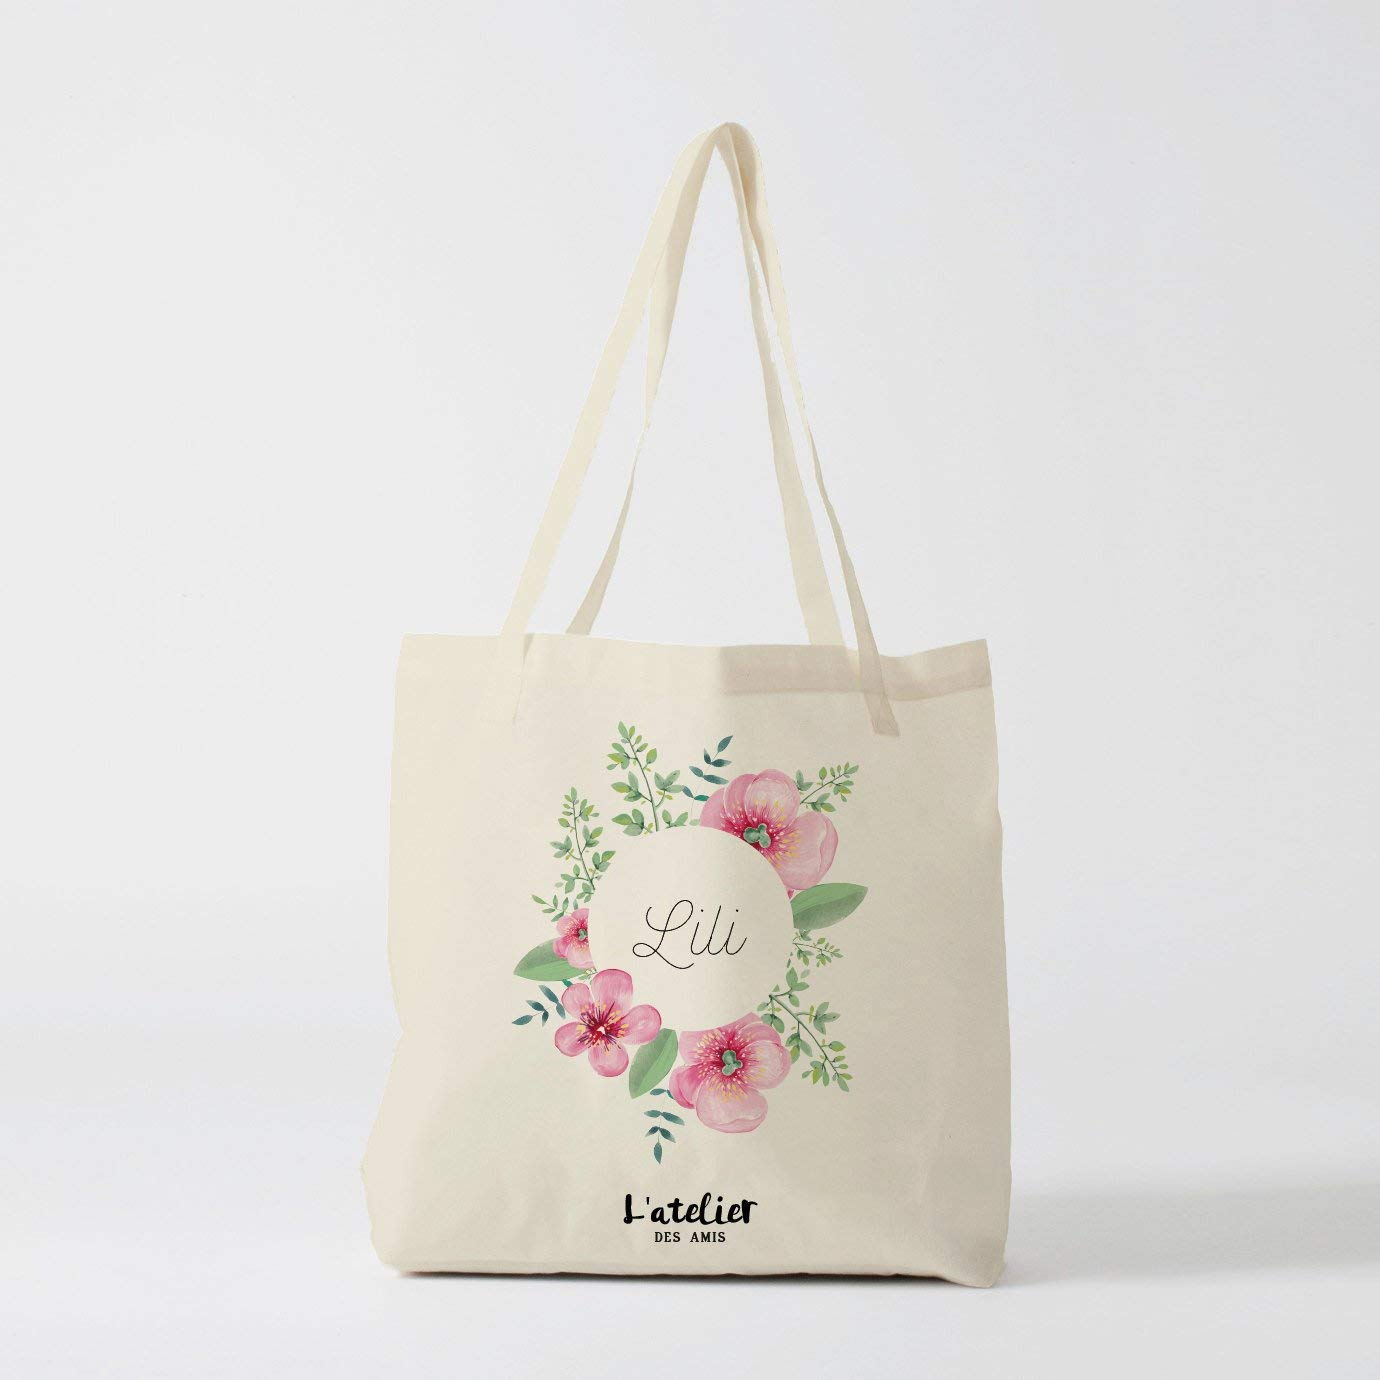 Bolsa personalizada para boda bolsa de lona bolsa de algodón ...